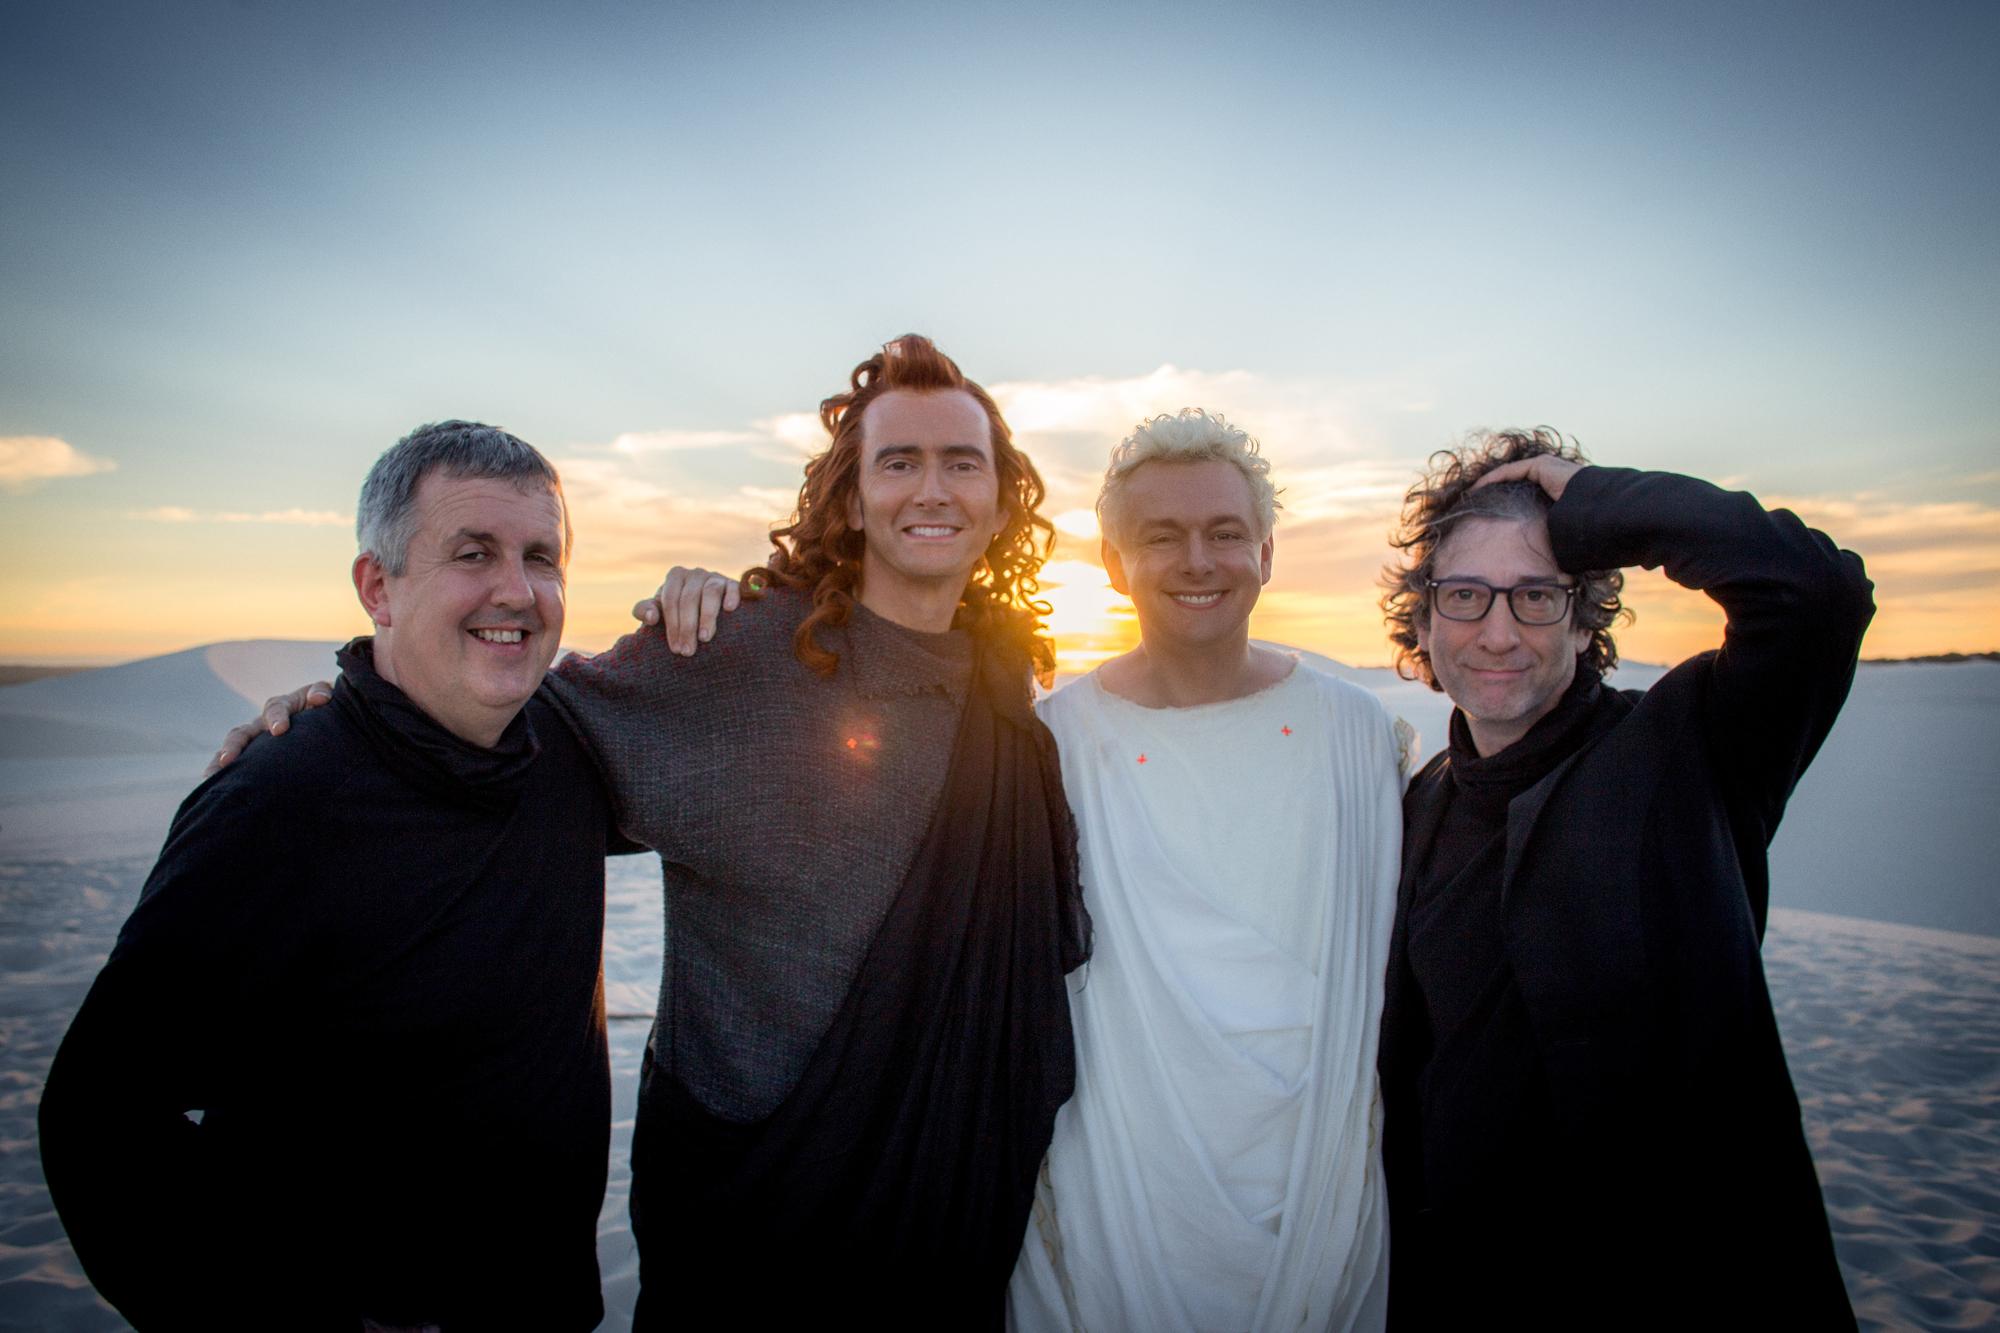 <em>Good Omens</em> director Douglas Mackinnon, stars David Tennant and Michael Sheen, and author Neil Gaiman